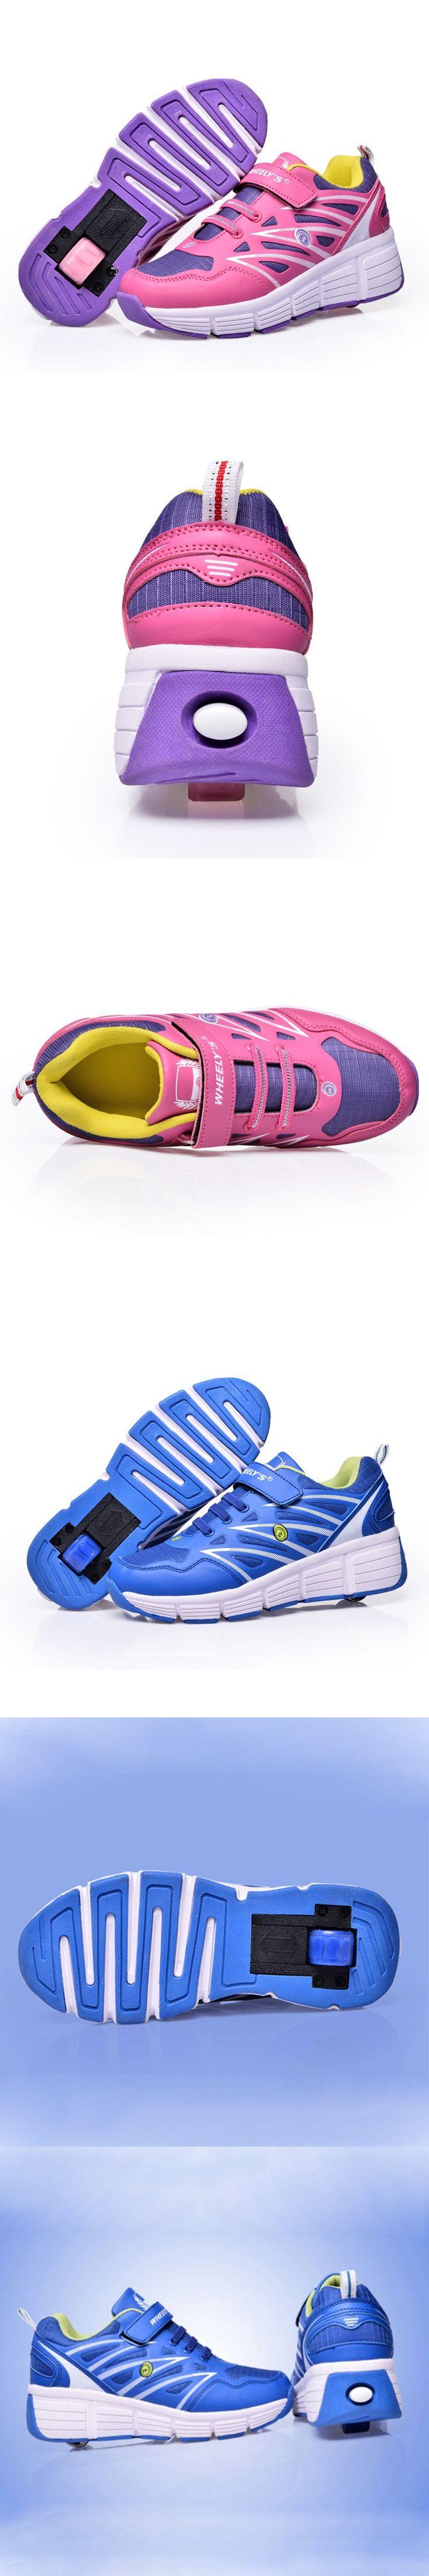 Roller shoes london - Children Heelys Kids Sneakers With Wheels Boys Girls Skate Roller Shoes Ultra Light Men Women